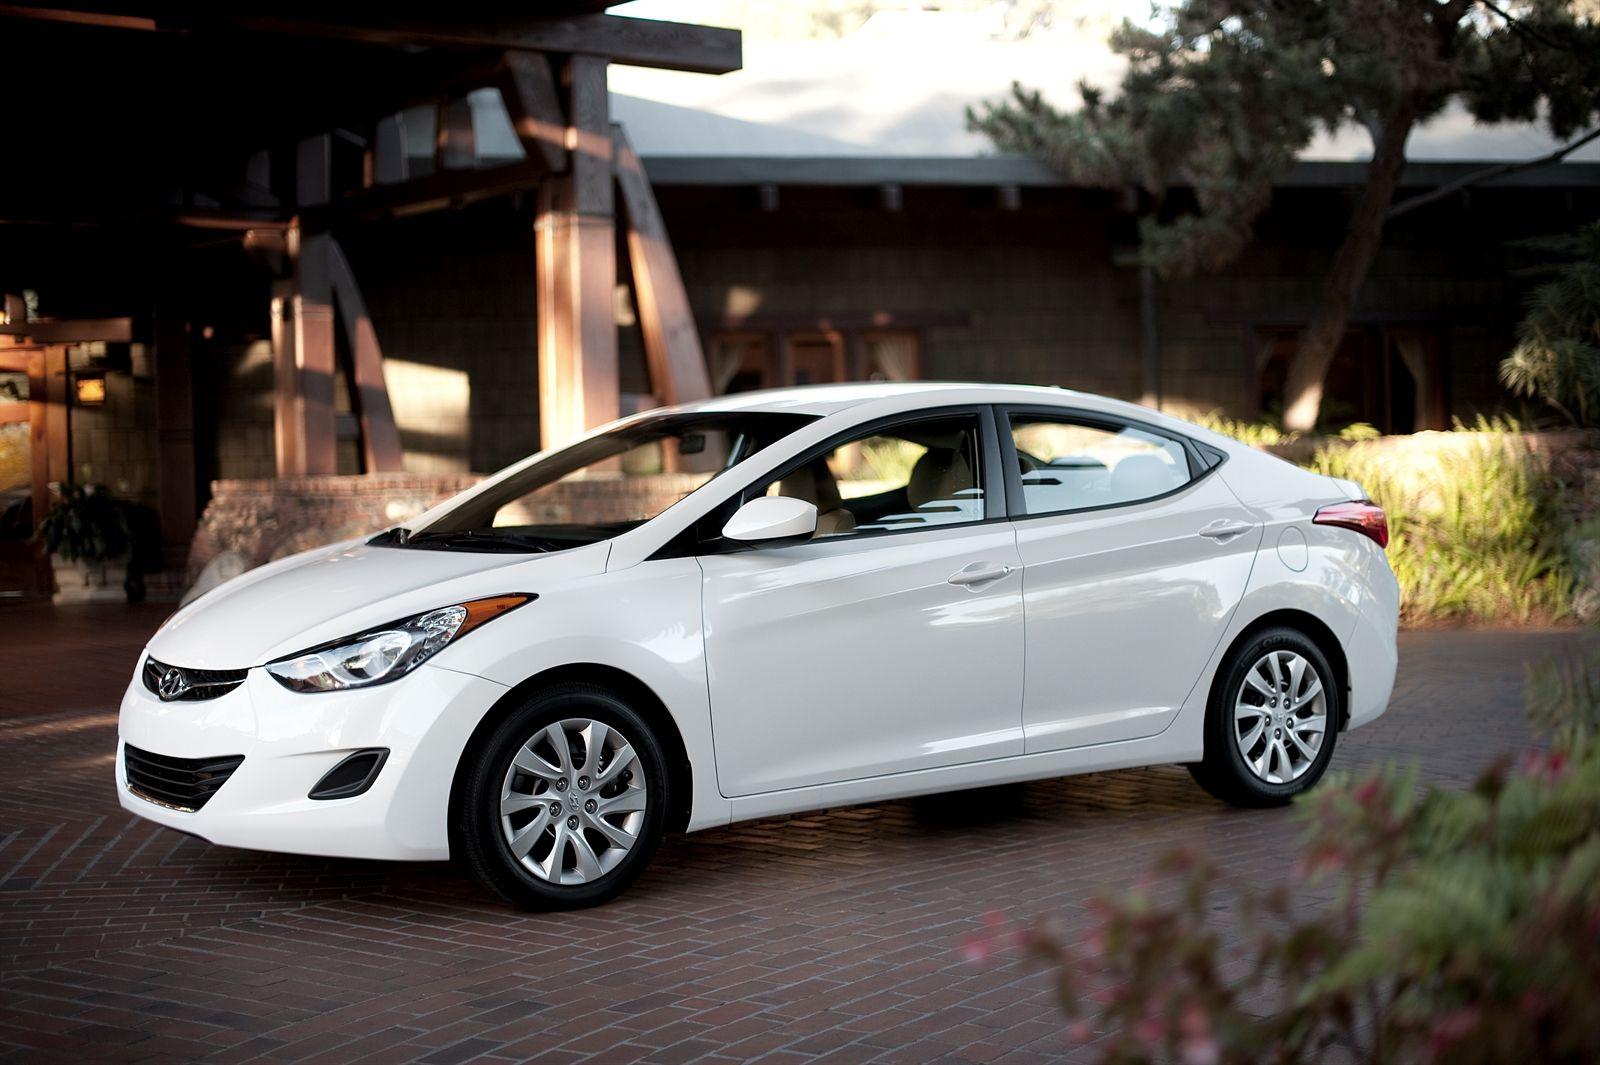 2013 Hyundai Elantra Recalled For Brake Light Problem Over 64 000 Vehicles Affected Elantra Hyundai Elantra Elantra Coupe